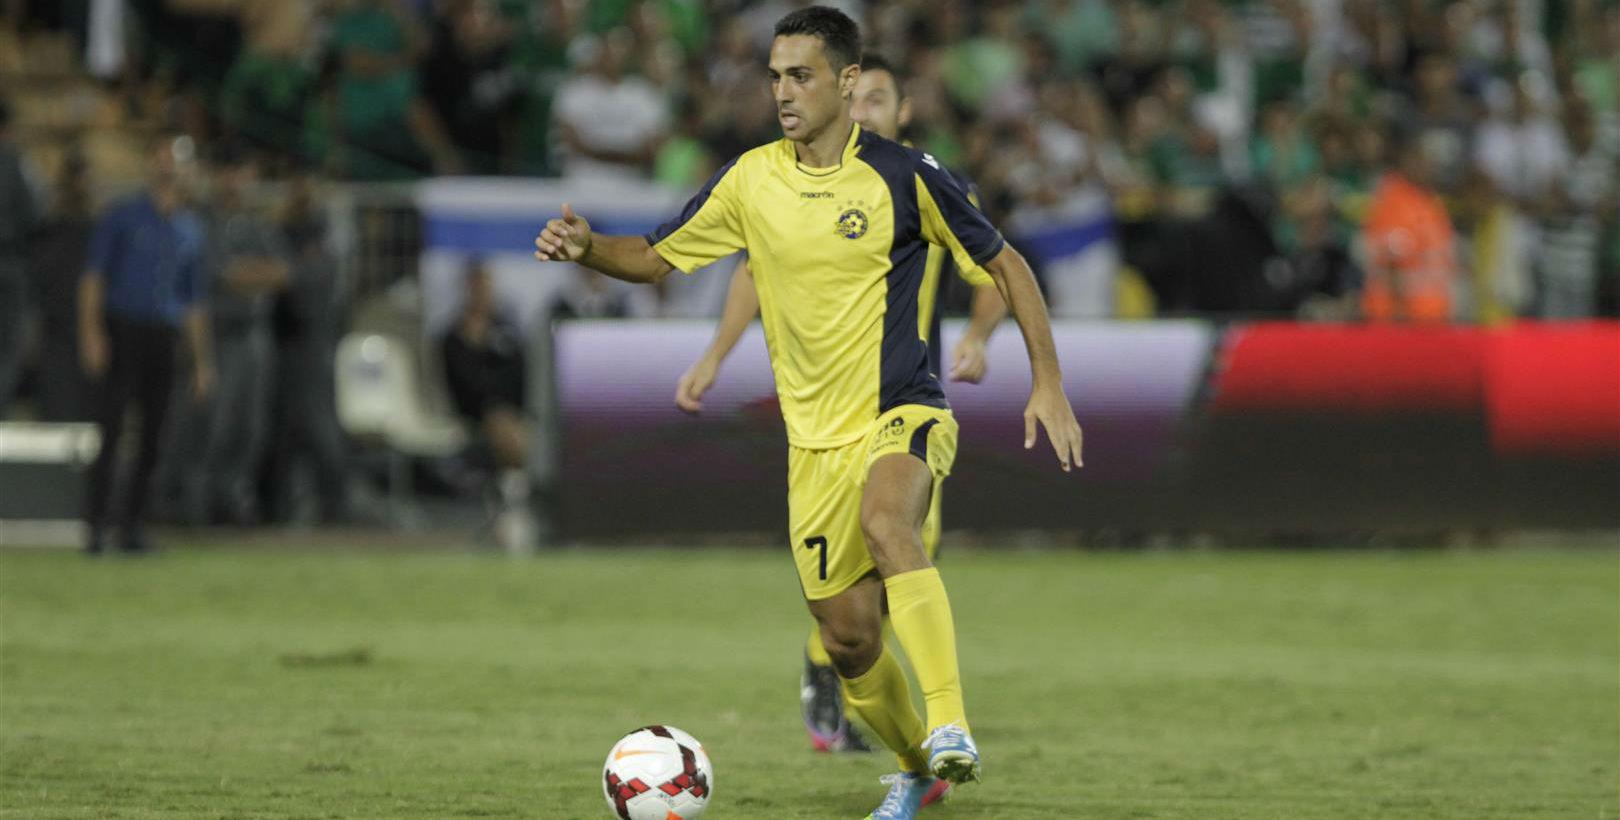 Eran Zehavi! Courtesy Maccabi Tel Aviv website